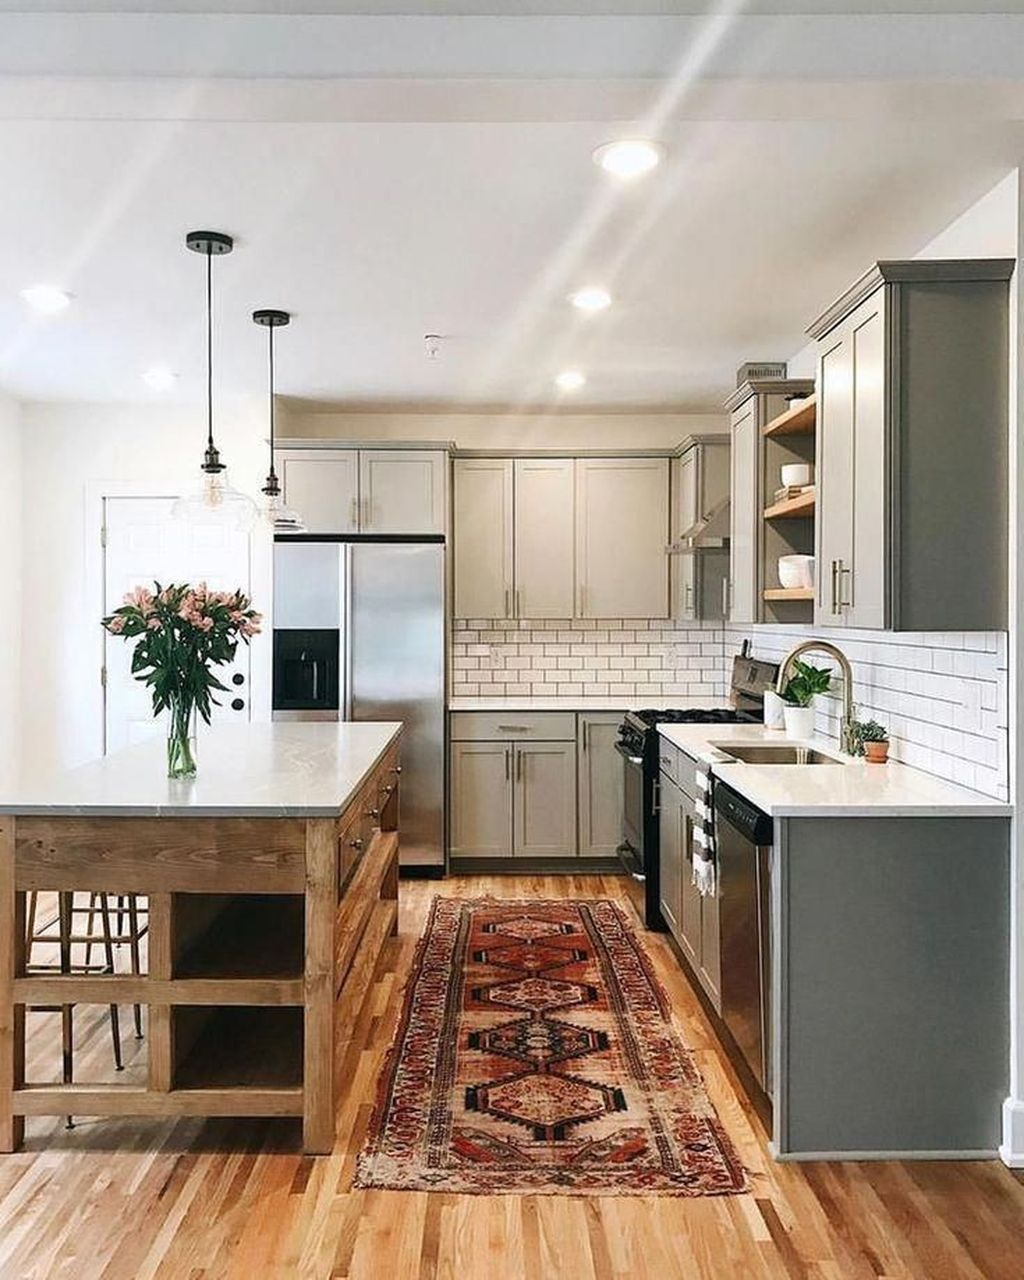 Popular Apartment Kitchen Design Ideas You Should Copy 02